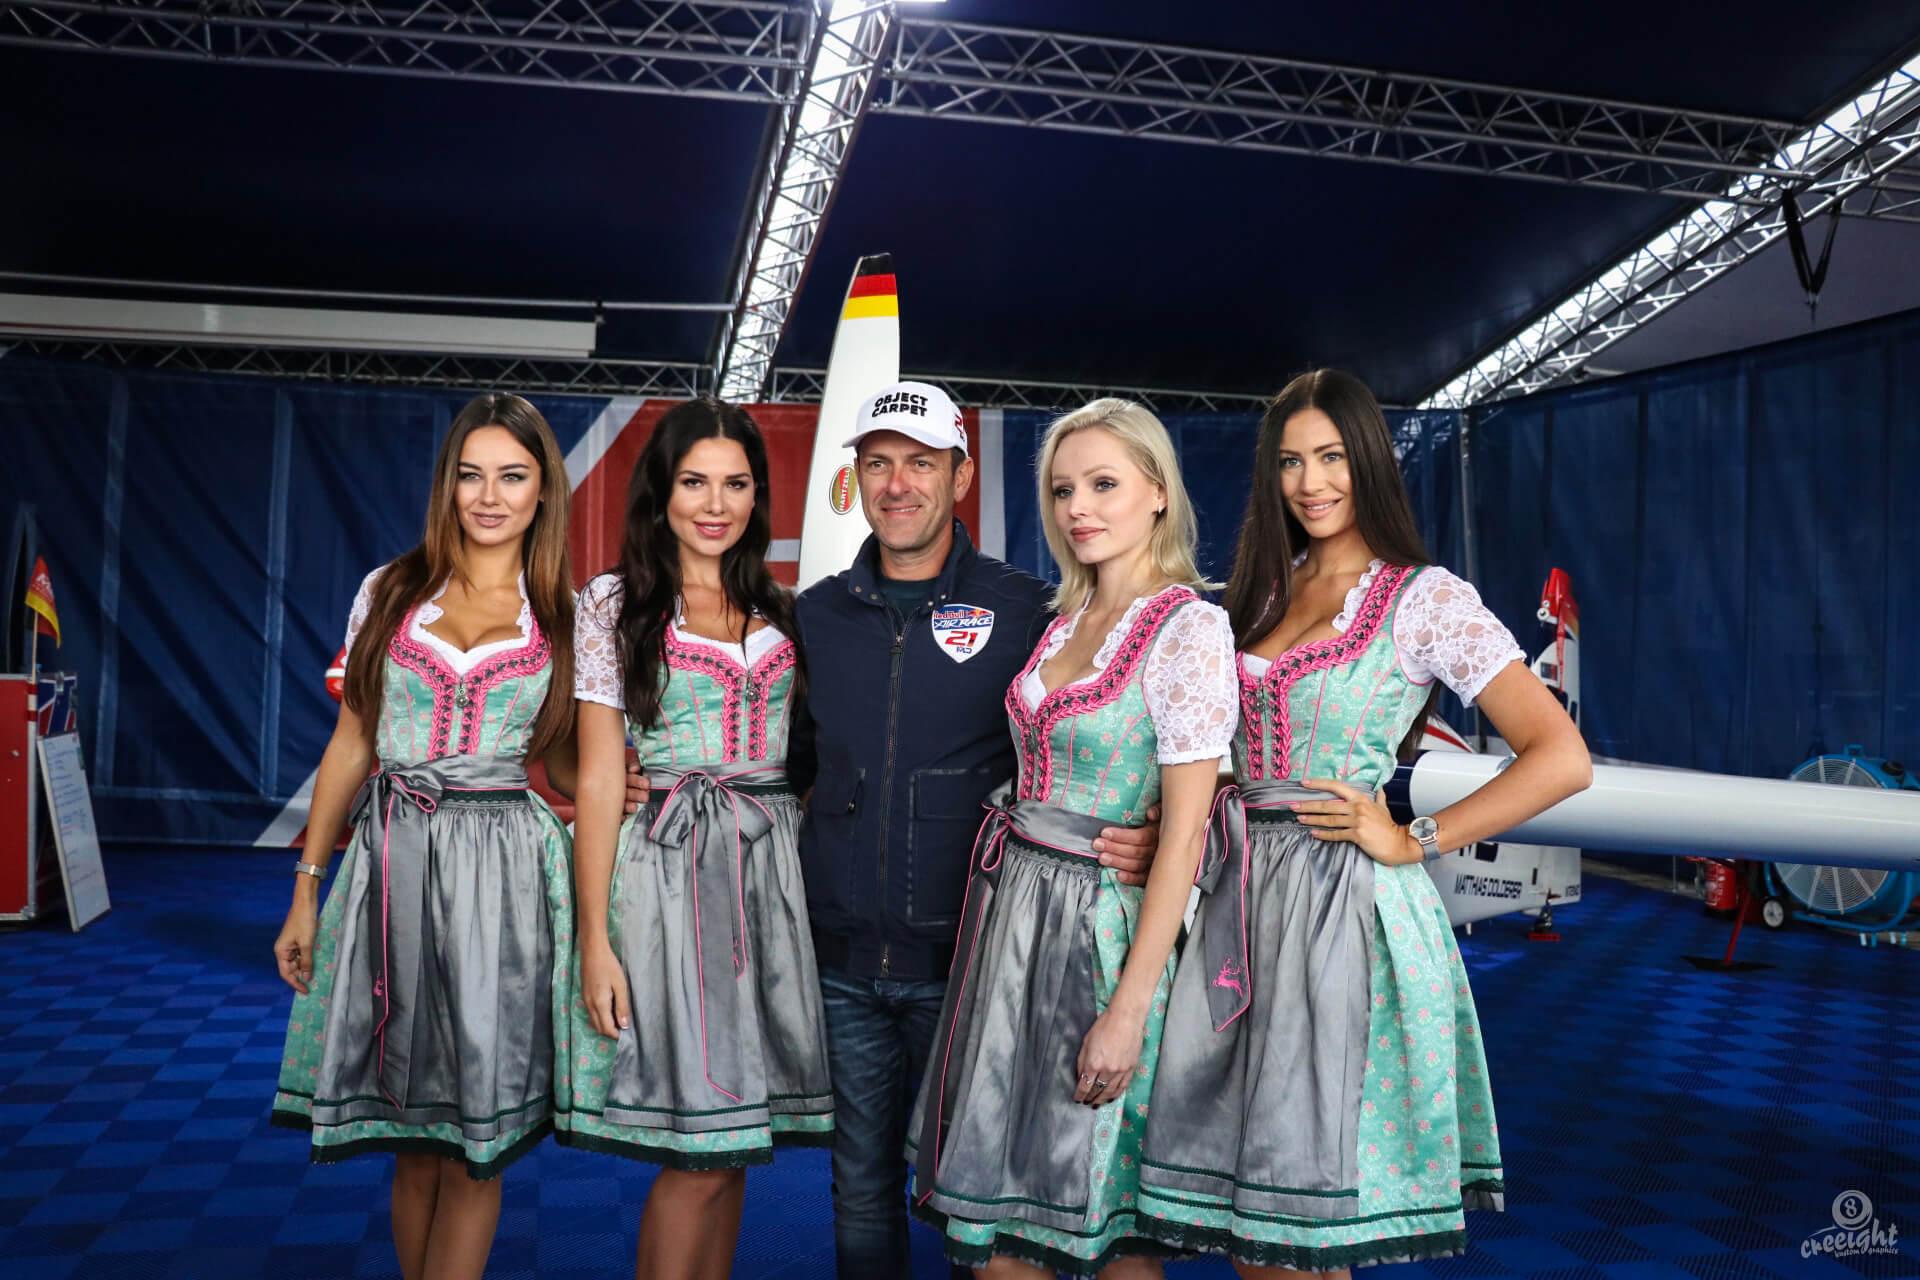 Matthias Dolderer, Red Bul Air Race 2017, Lausitzring